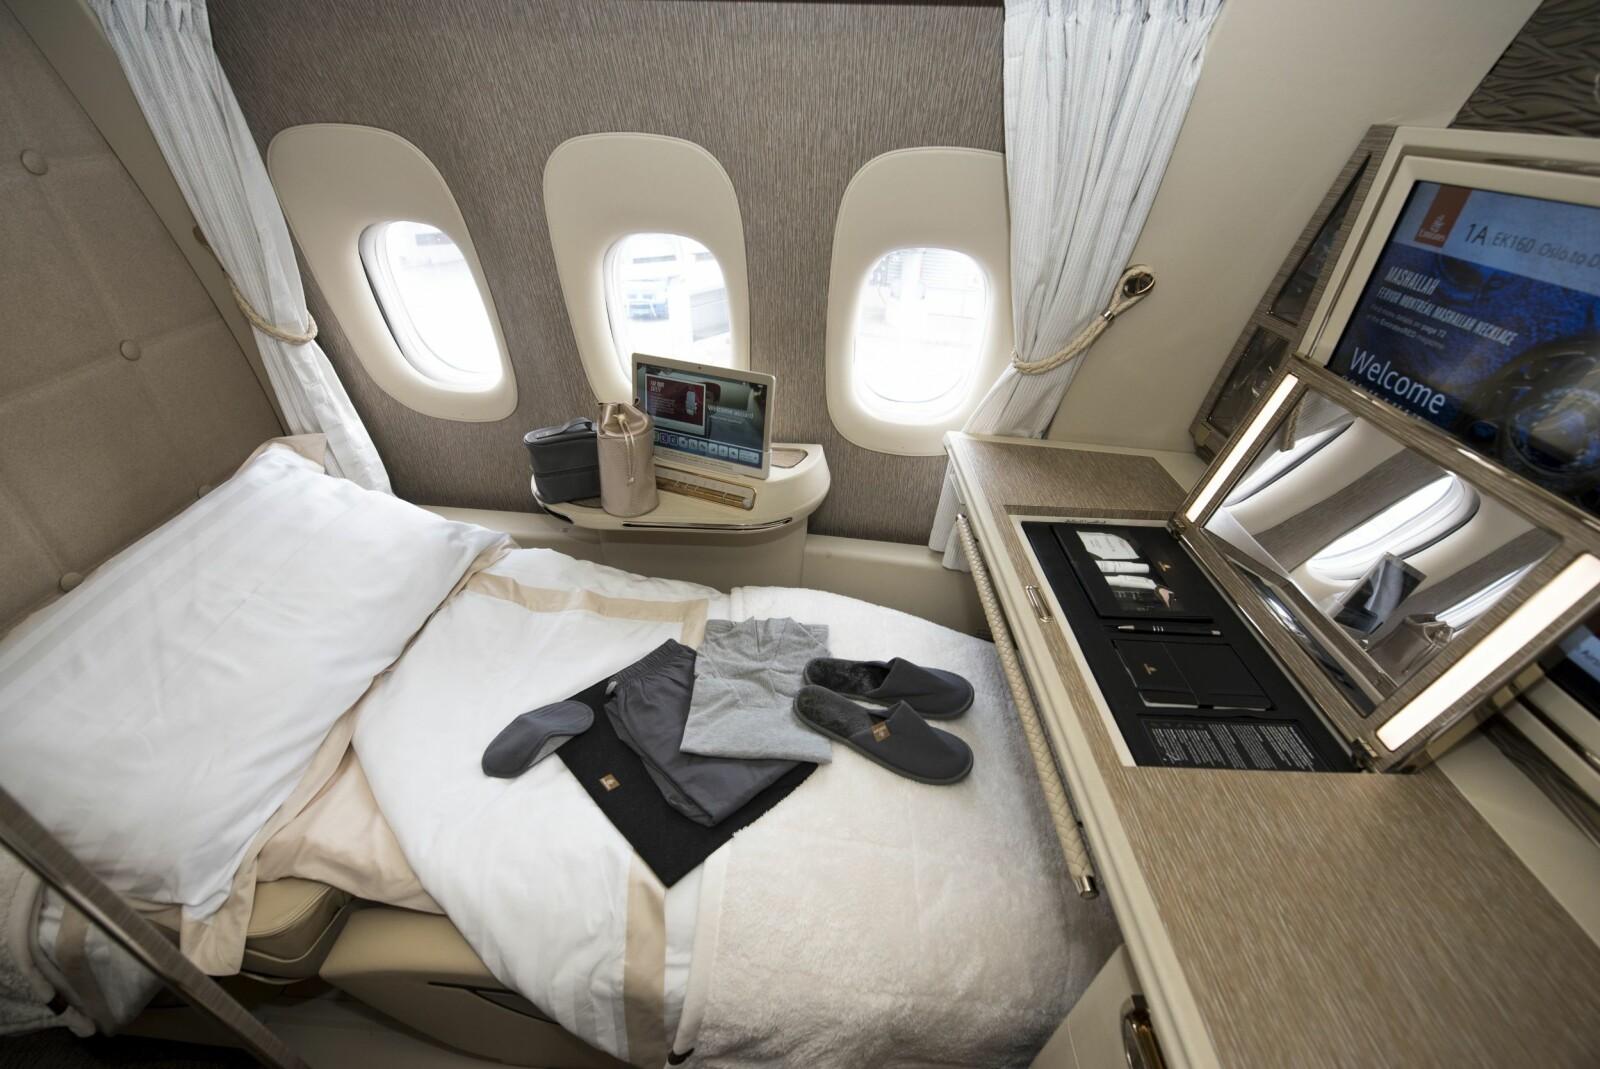 <b>SENG:</b> Hver suite kan gjøres om til sovelugar med sengetøy.Foto: Håkon Bonafede